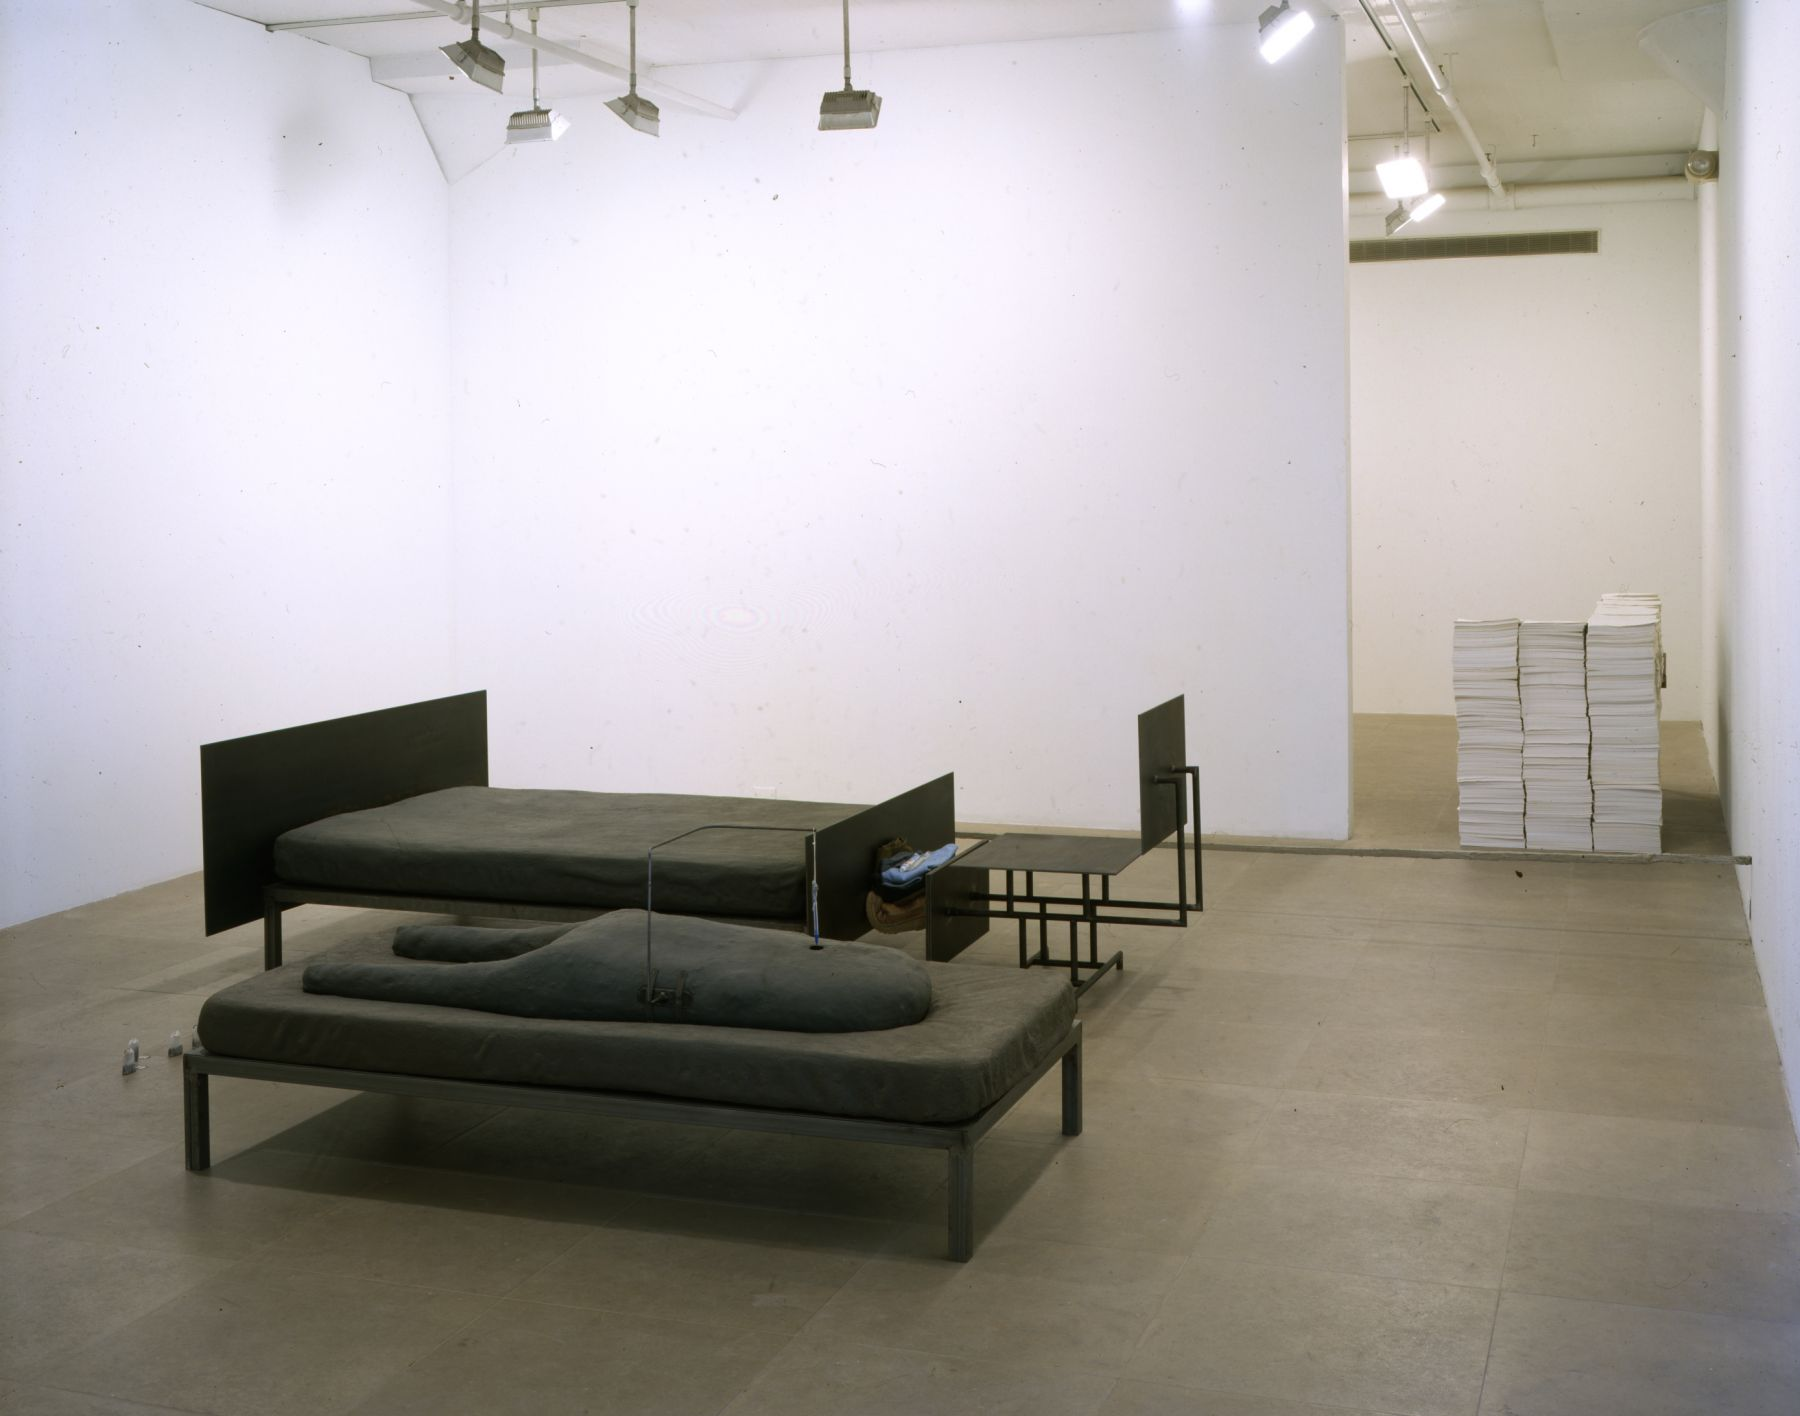 Installation view, Greene Naftali, New York, 2002